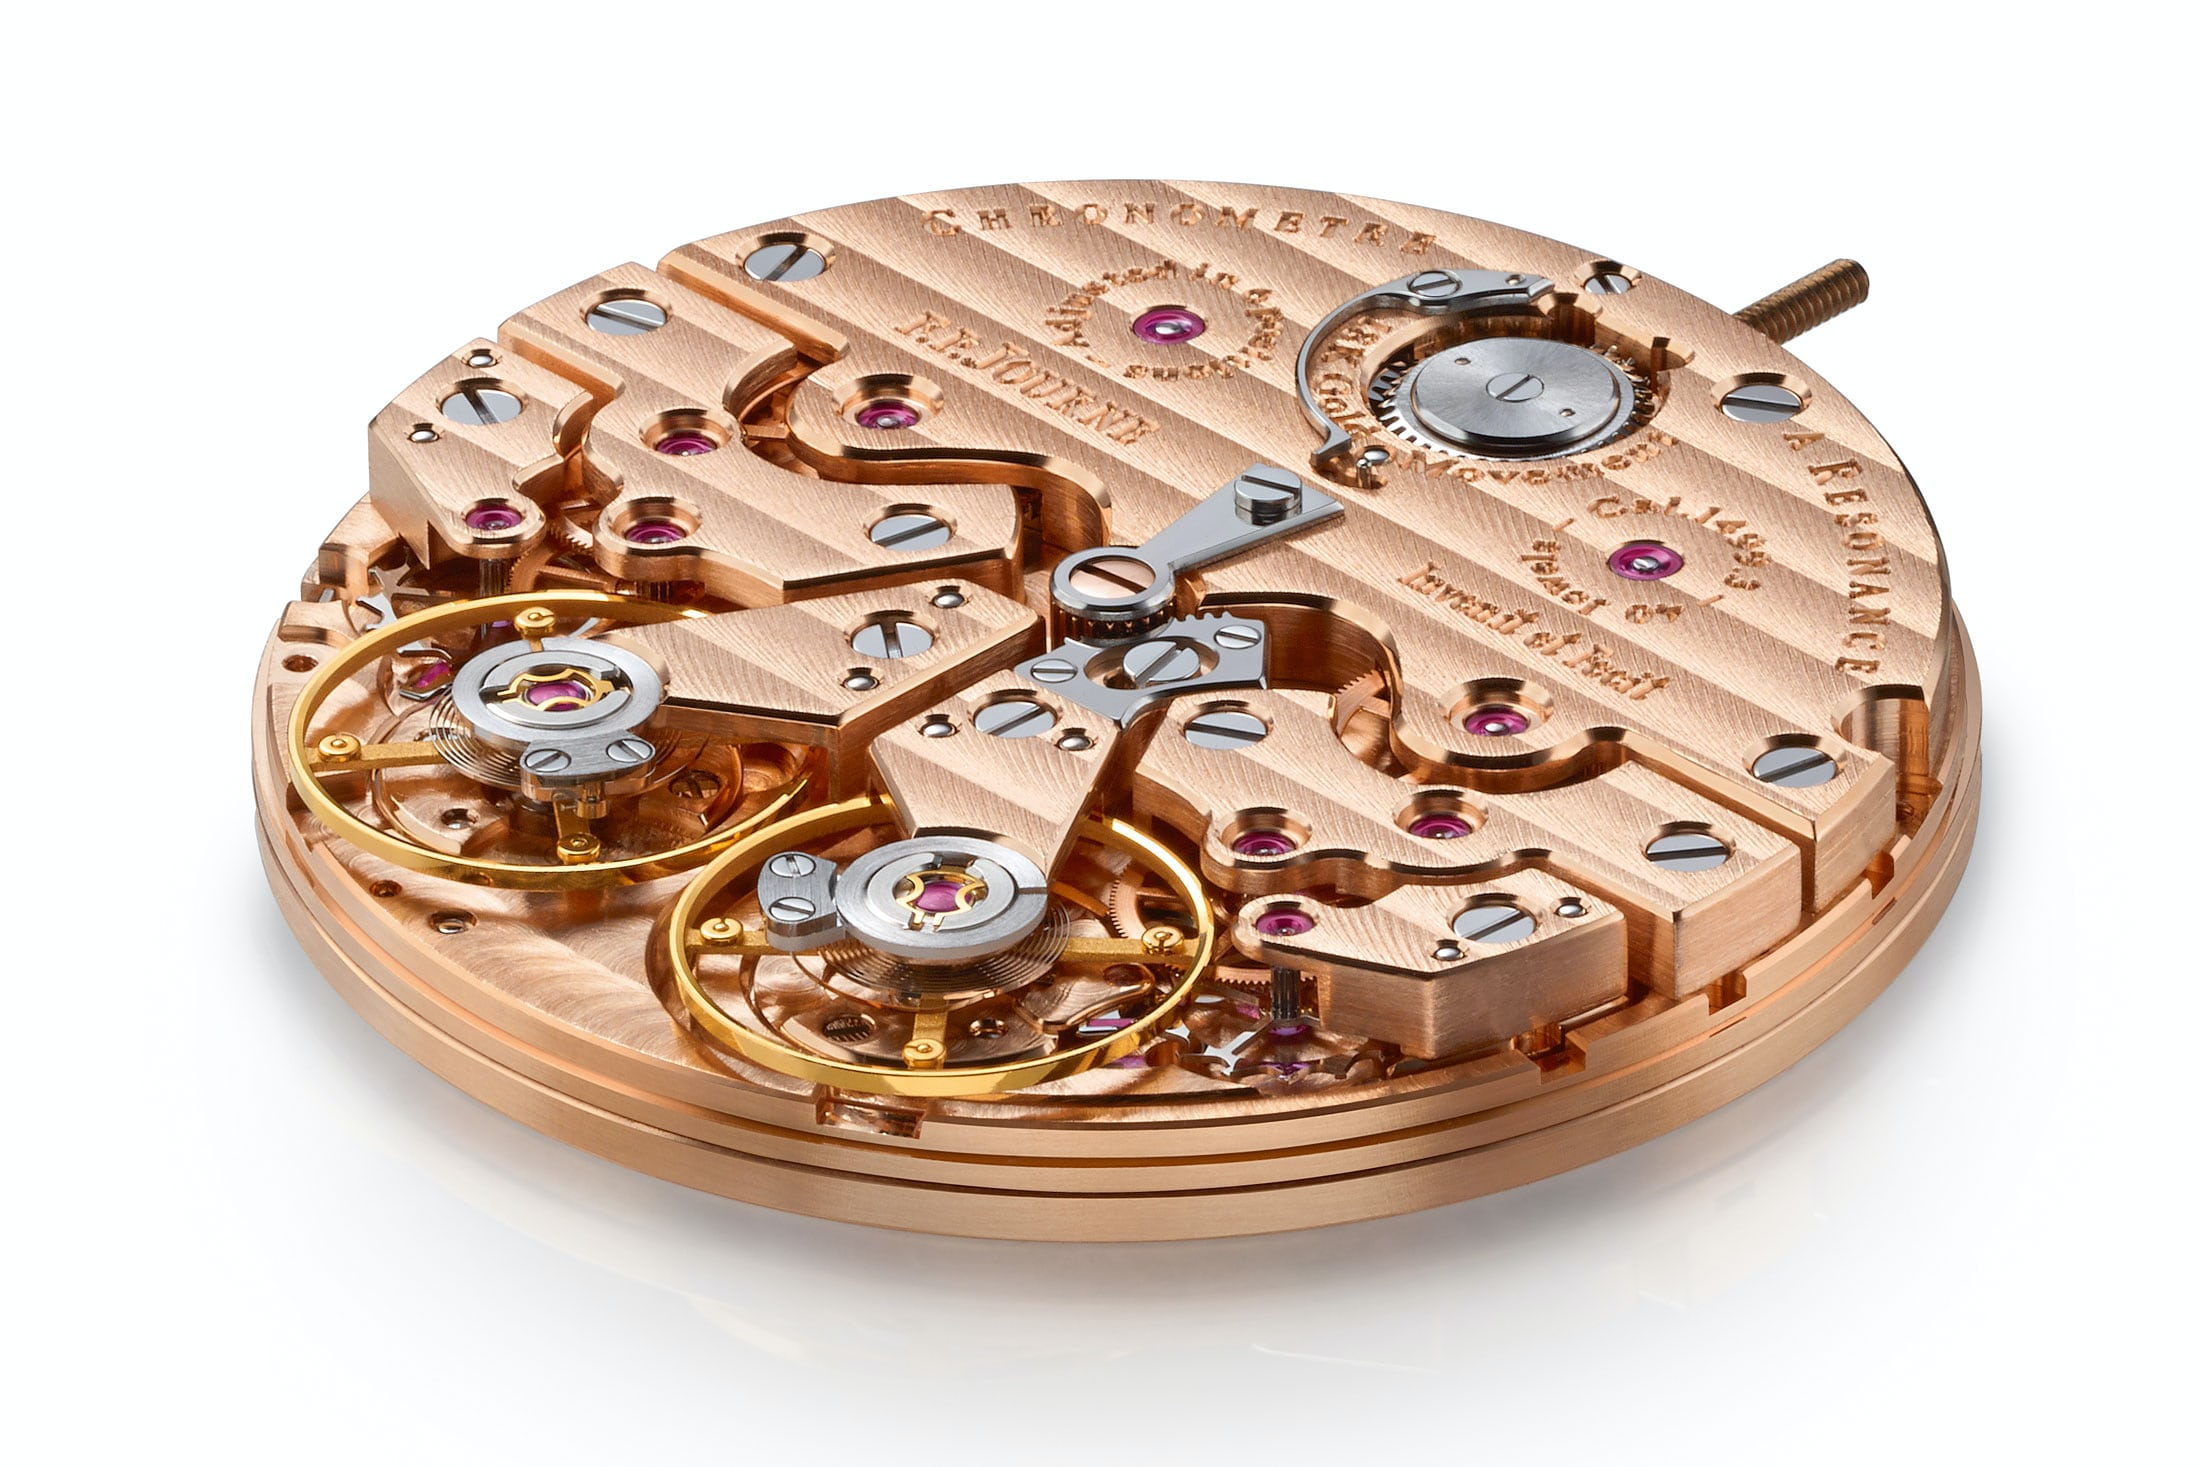 fp-journe-chronometre-a-resonance-1499.3